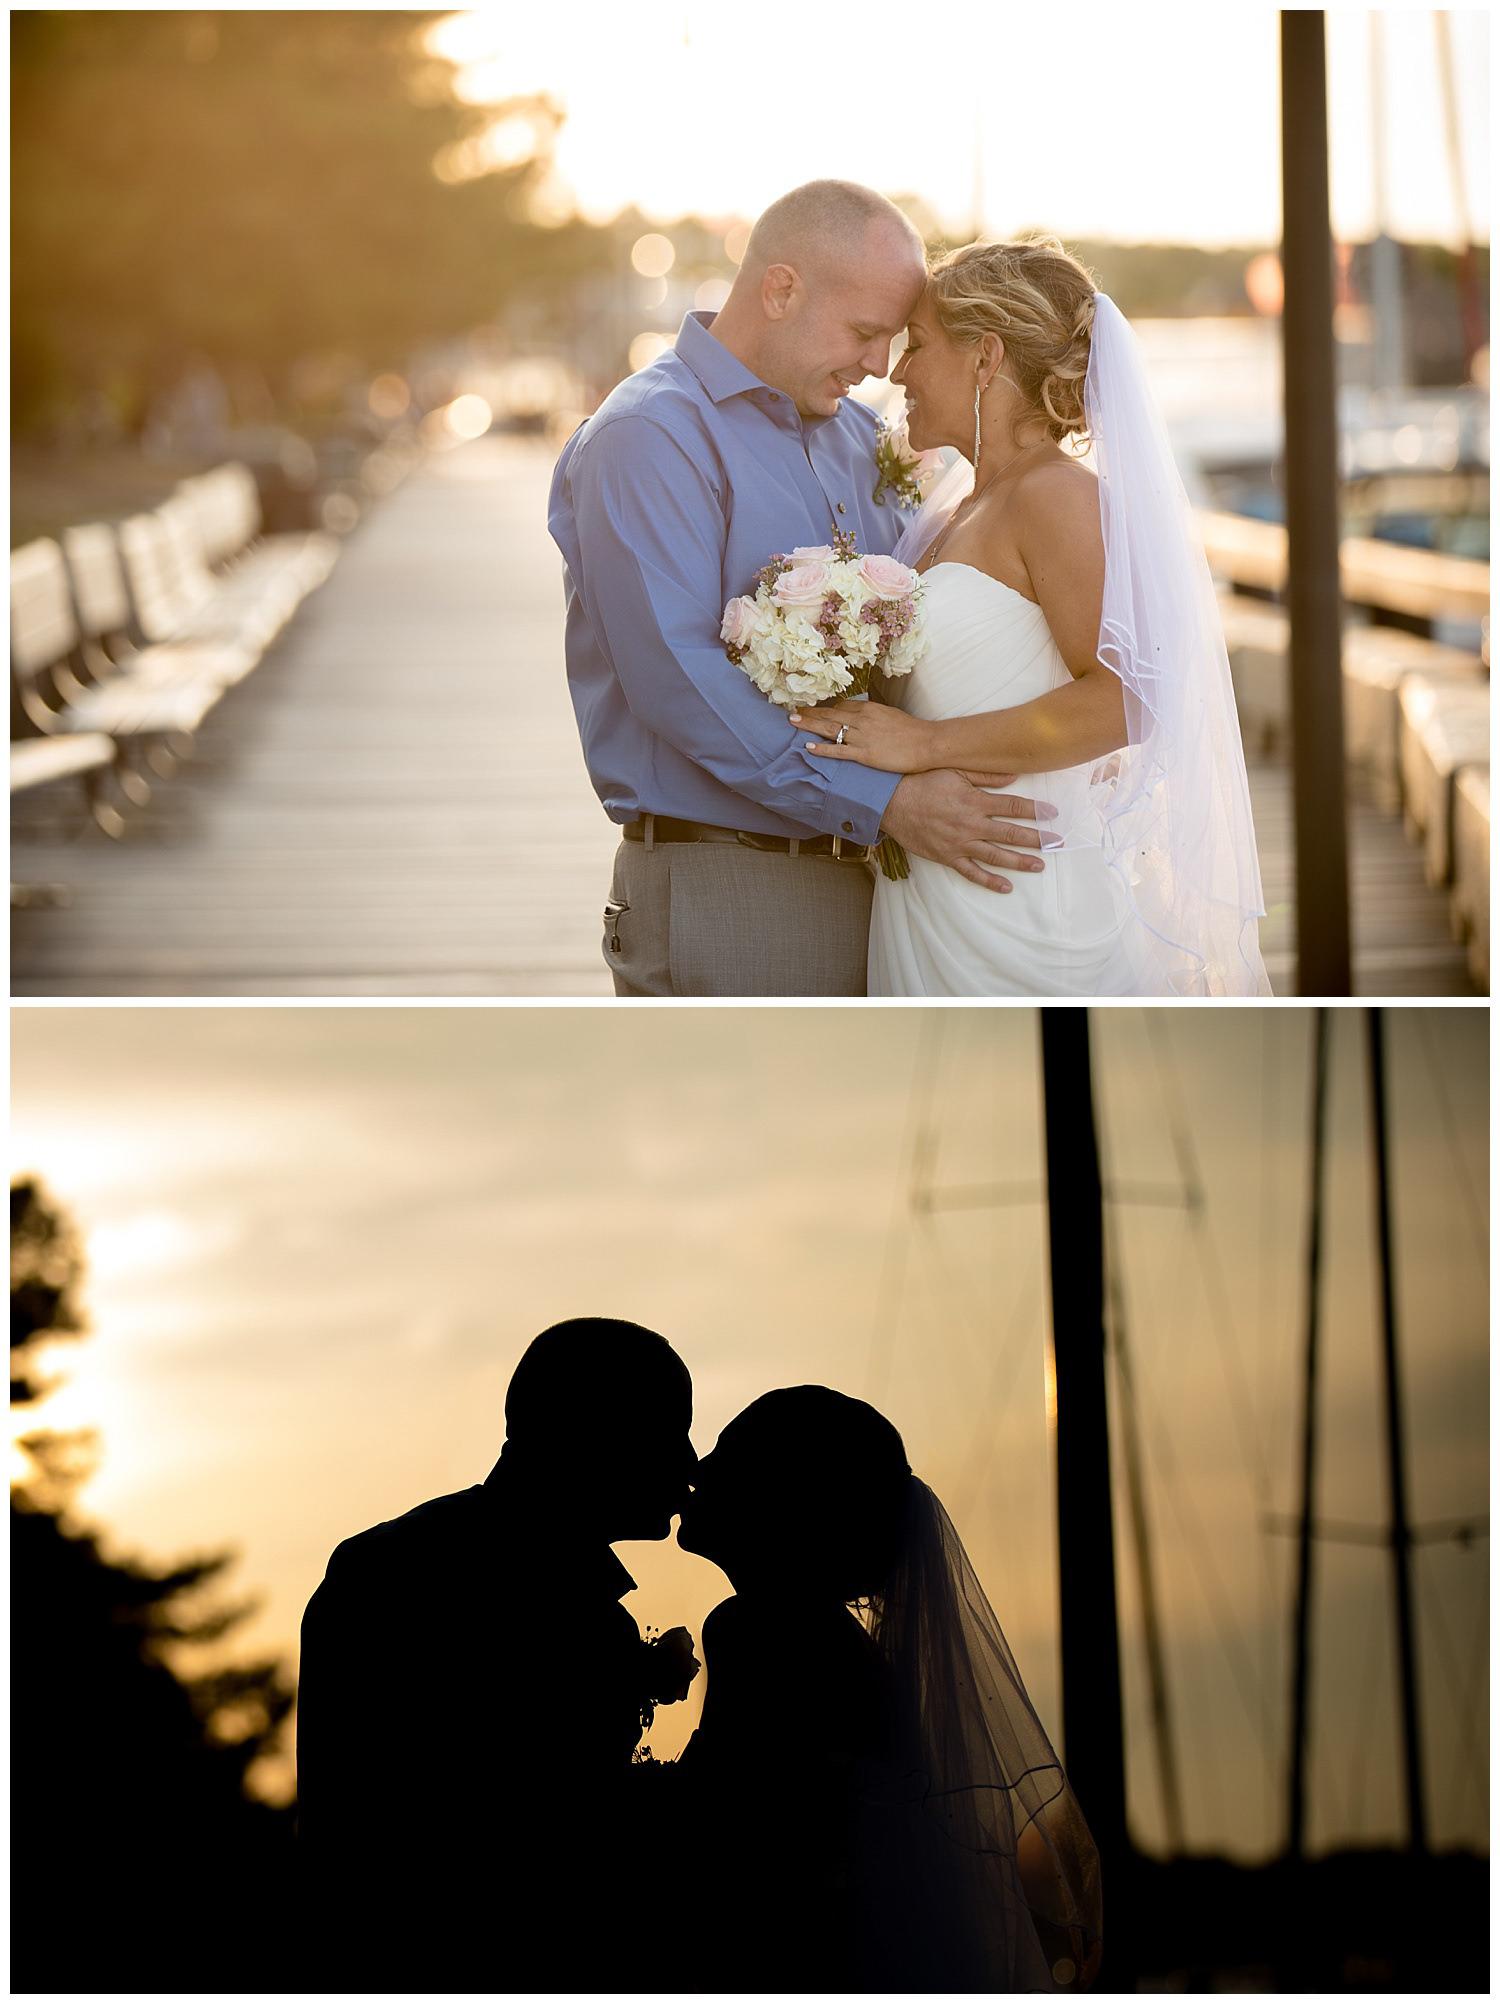 boston-wedding-photographer-26-north-studios-023.jpg